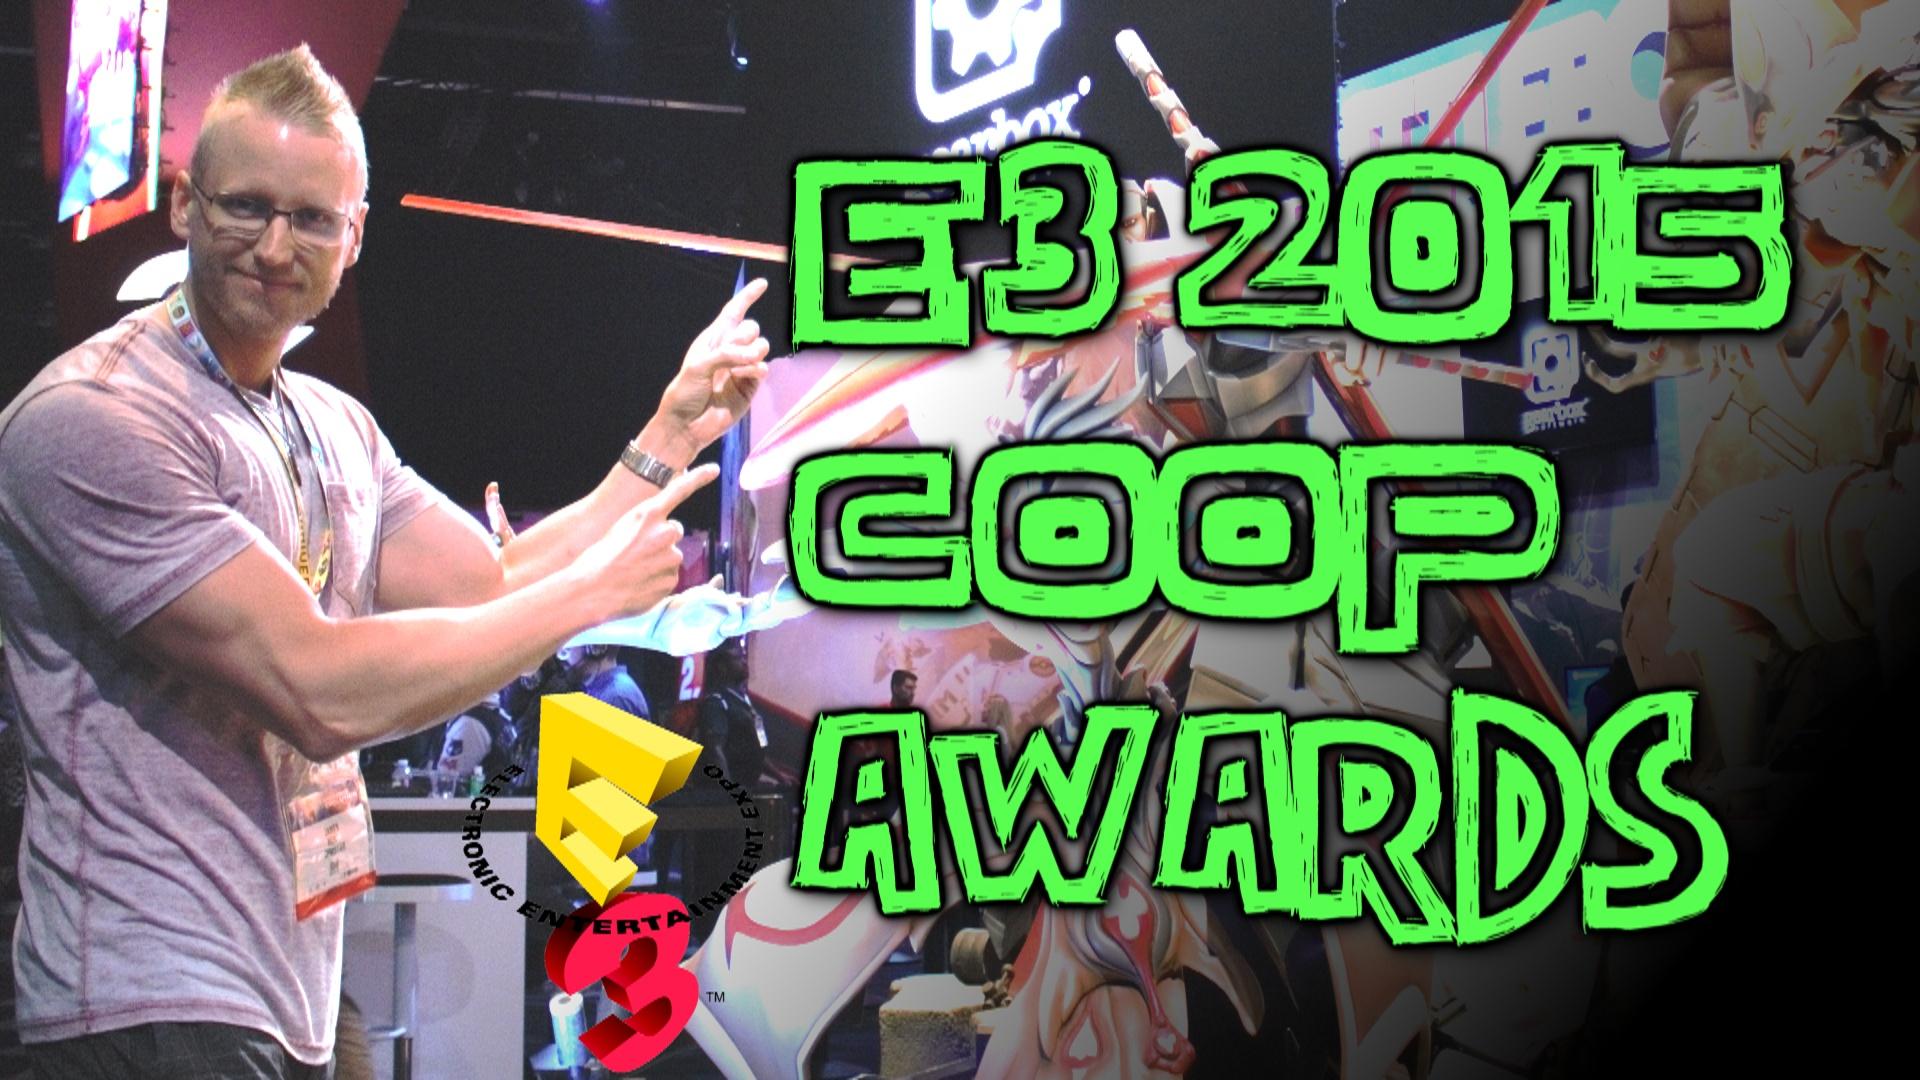 E3 2015 Coop Awards MMOHuts